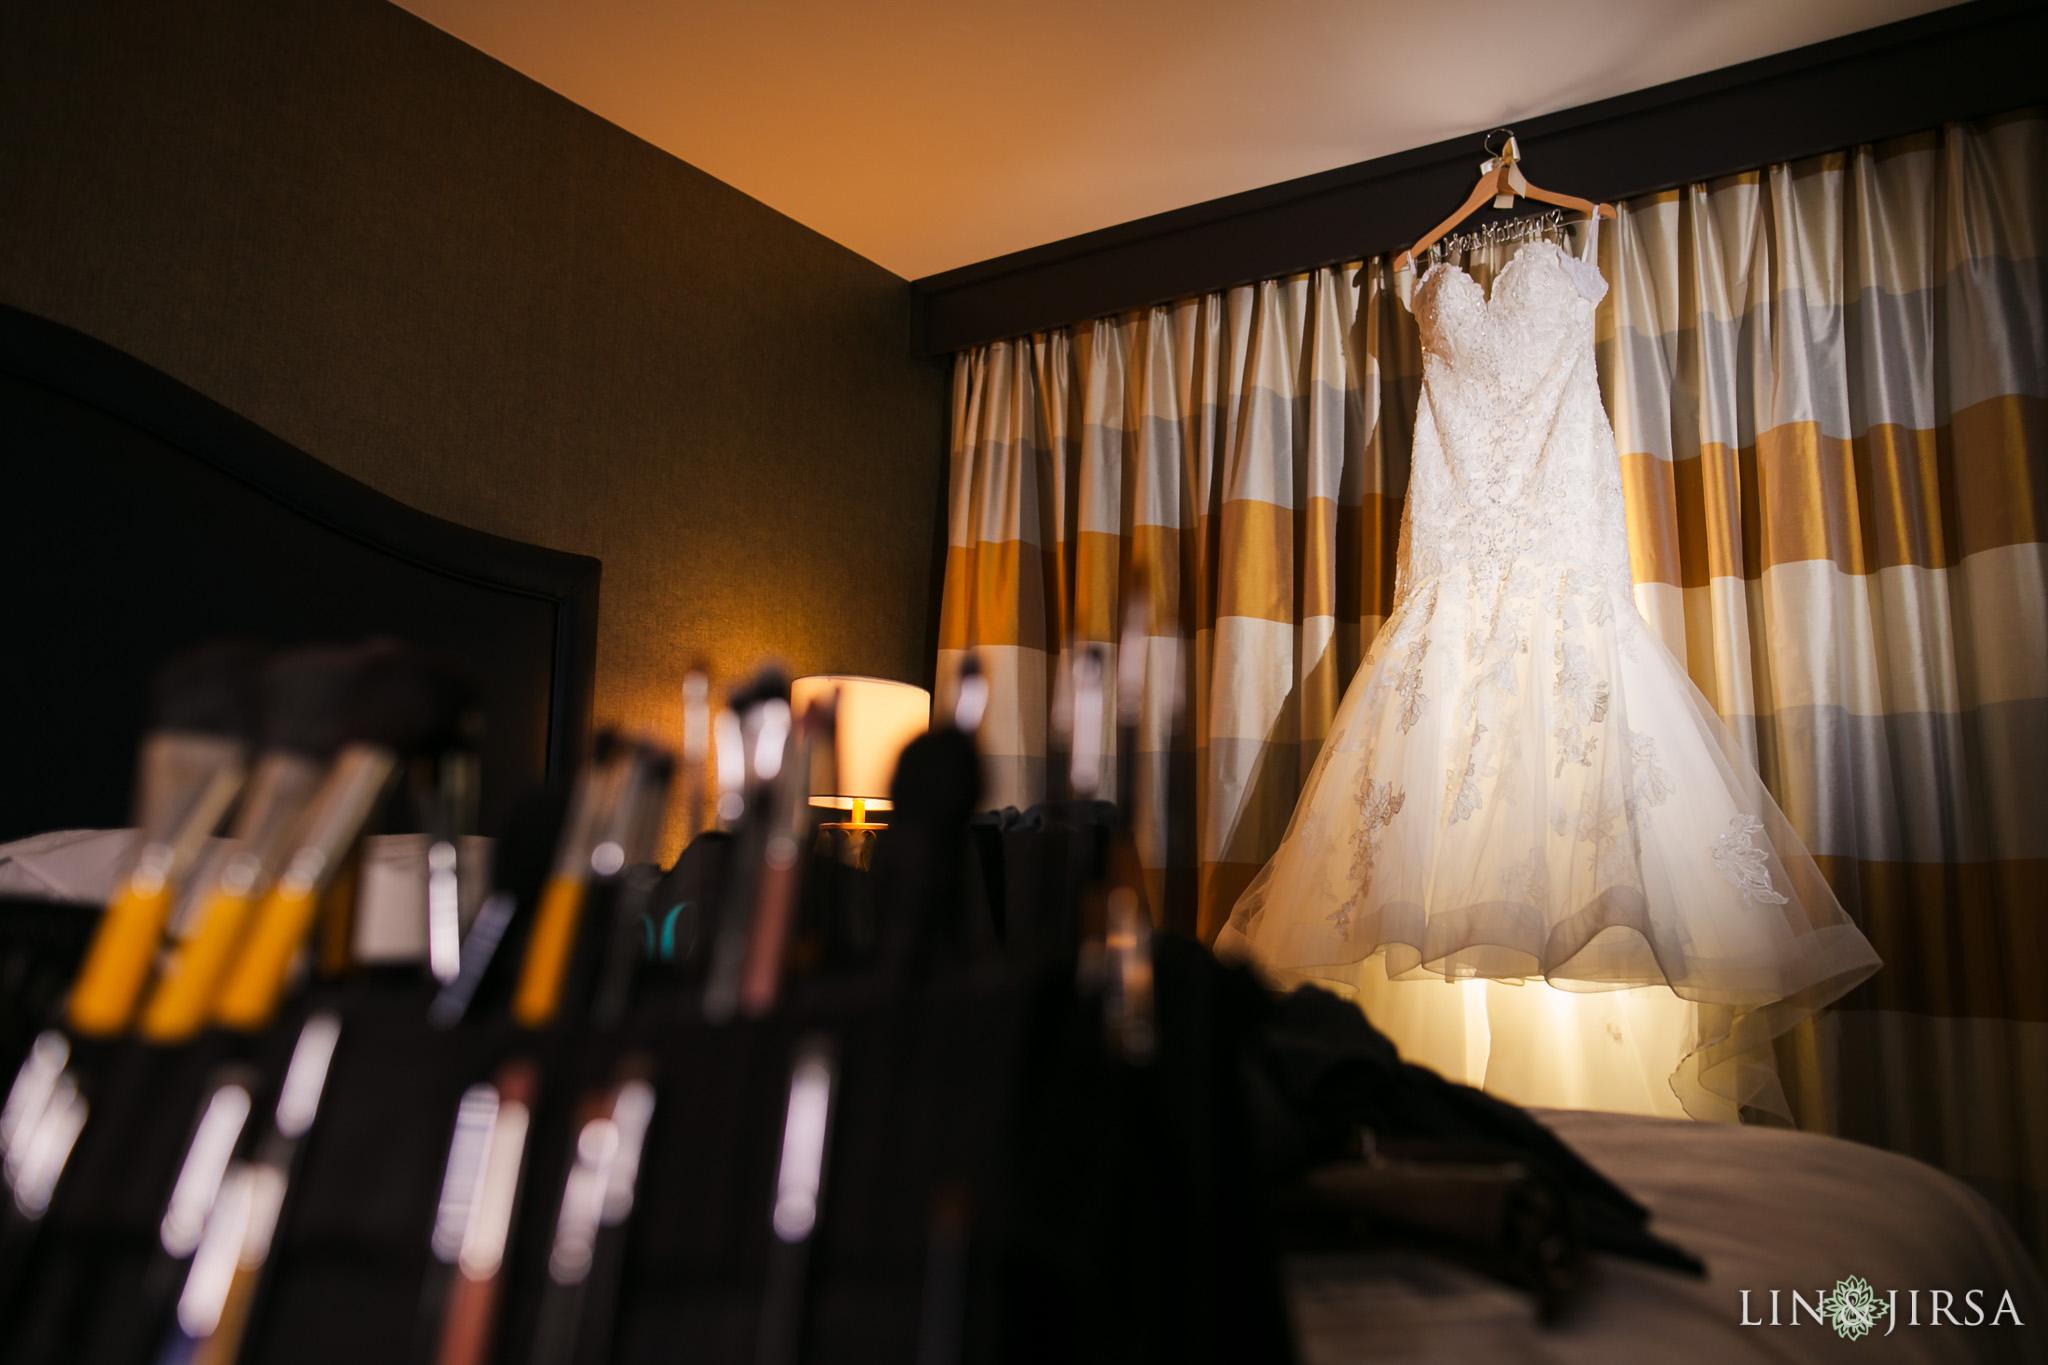 02 sheraton fairplex inland empire indian wedding photography